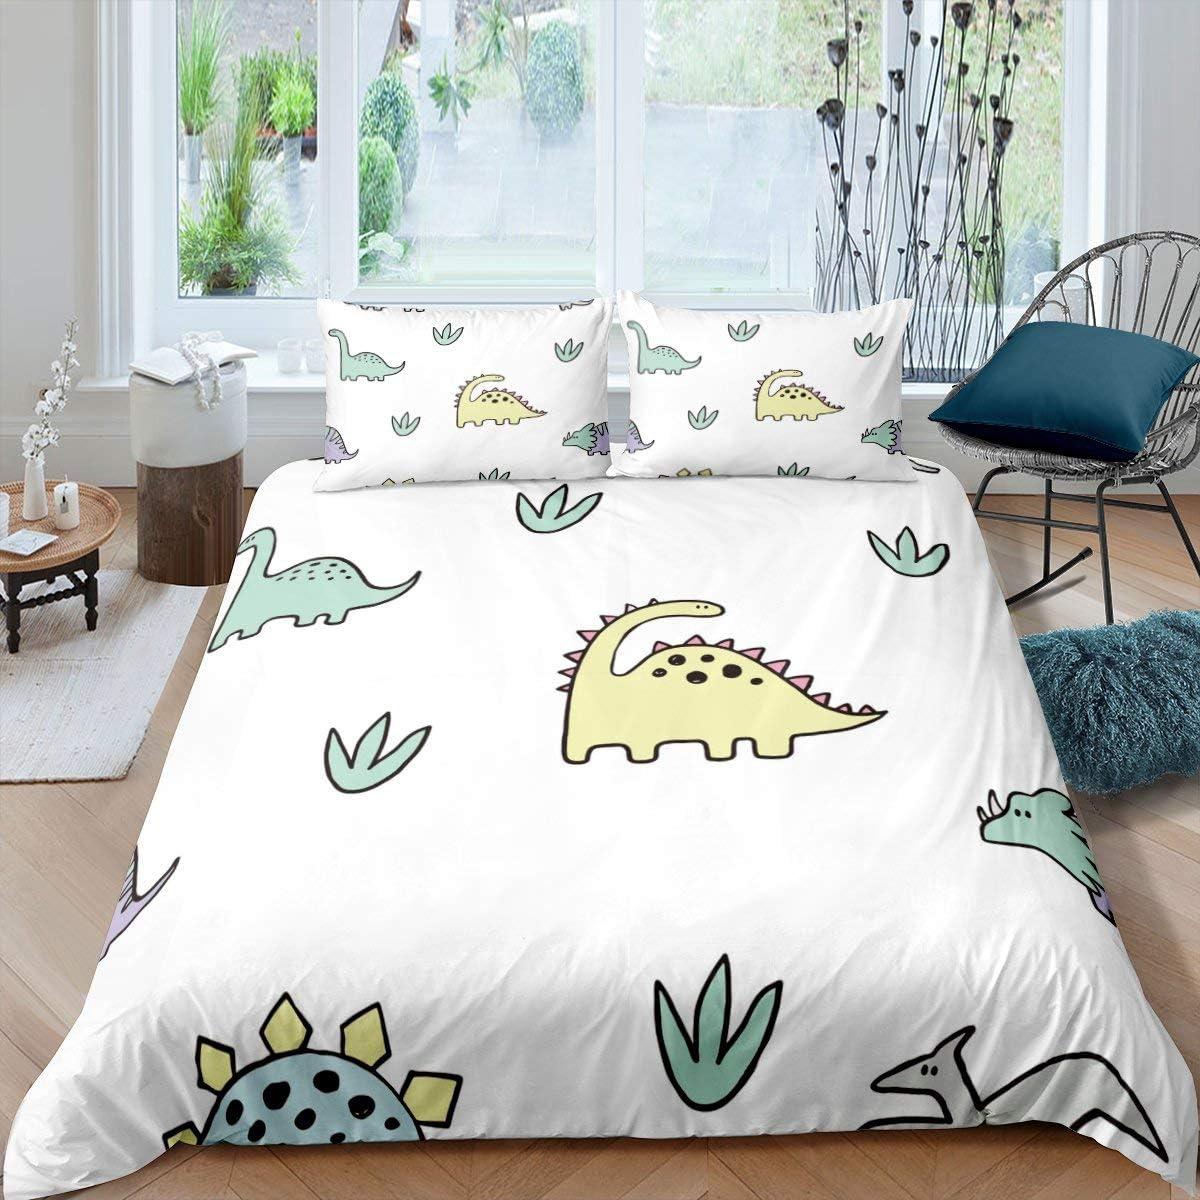 Erosebridal Dinosaur 送料無料激安祭 Duvet 激安 Cover Cartoon Comforter Cove